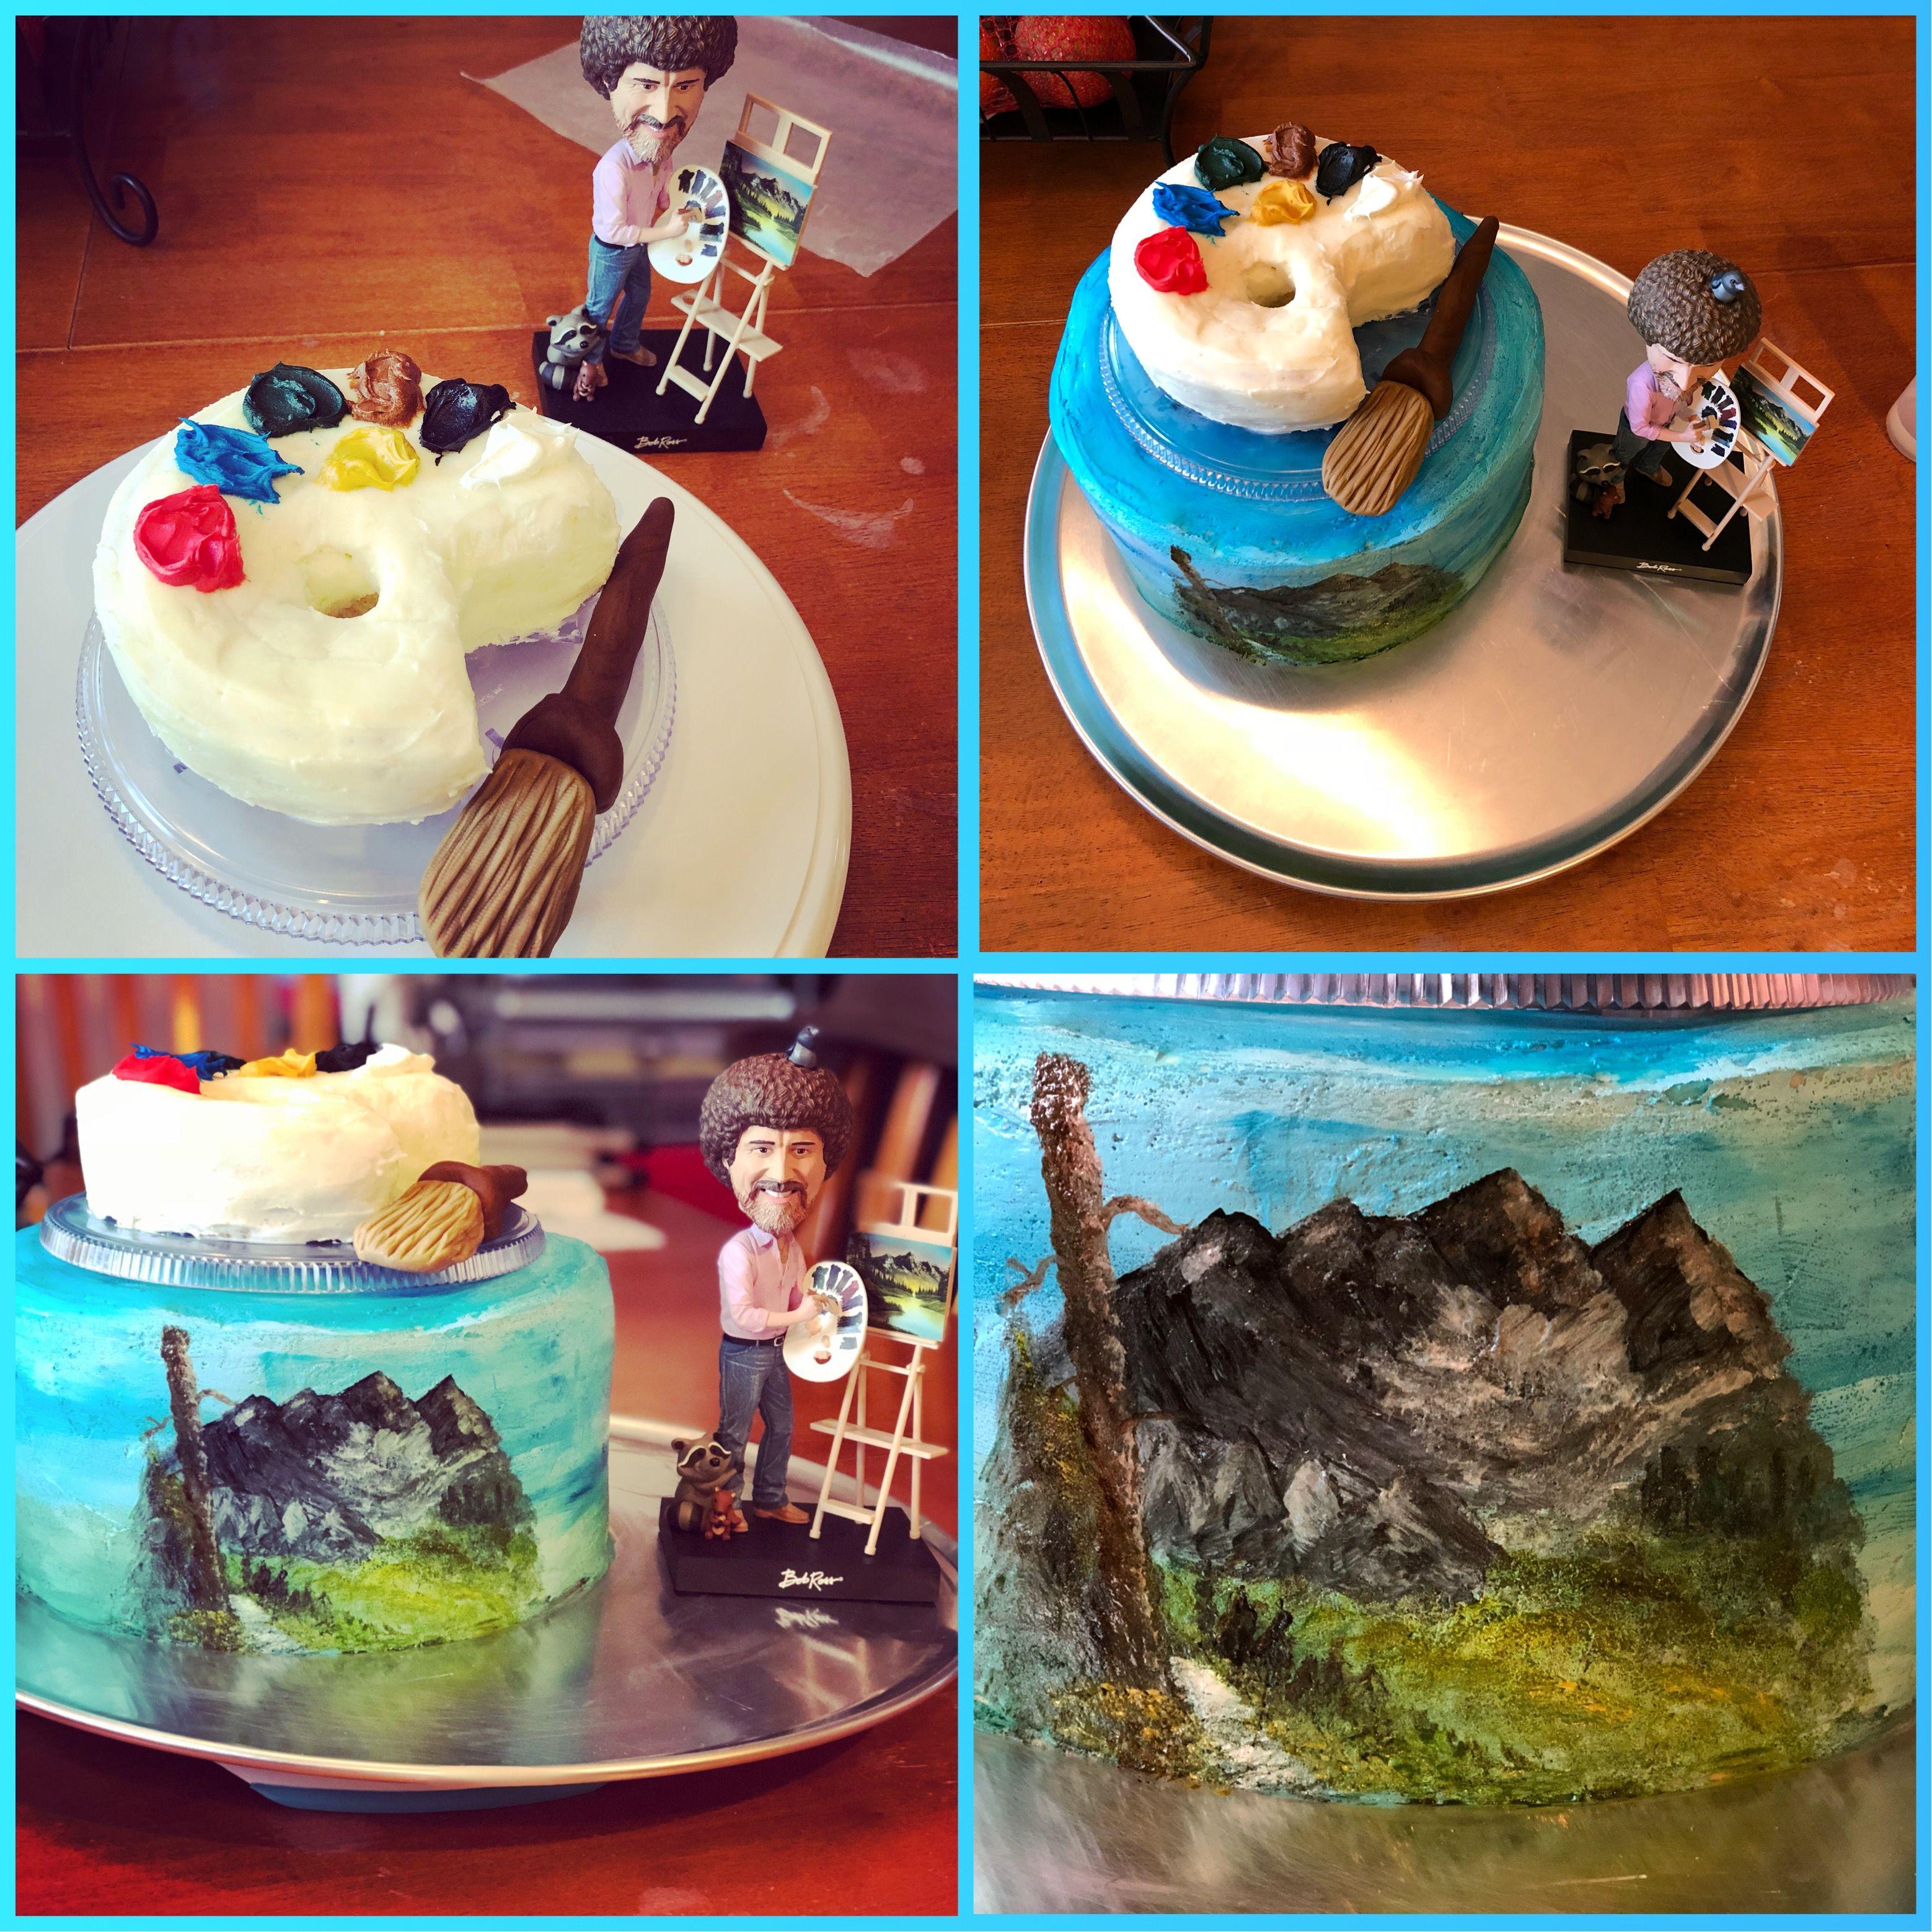 Son S 14th Birthday Cake Bob Ross Cake Bob Ross Birthday 14th Birthday Cakes Bob Ross